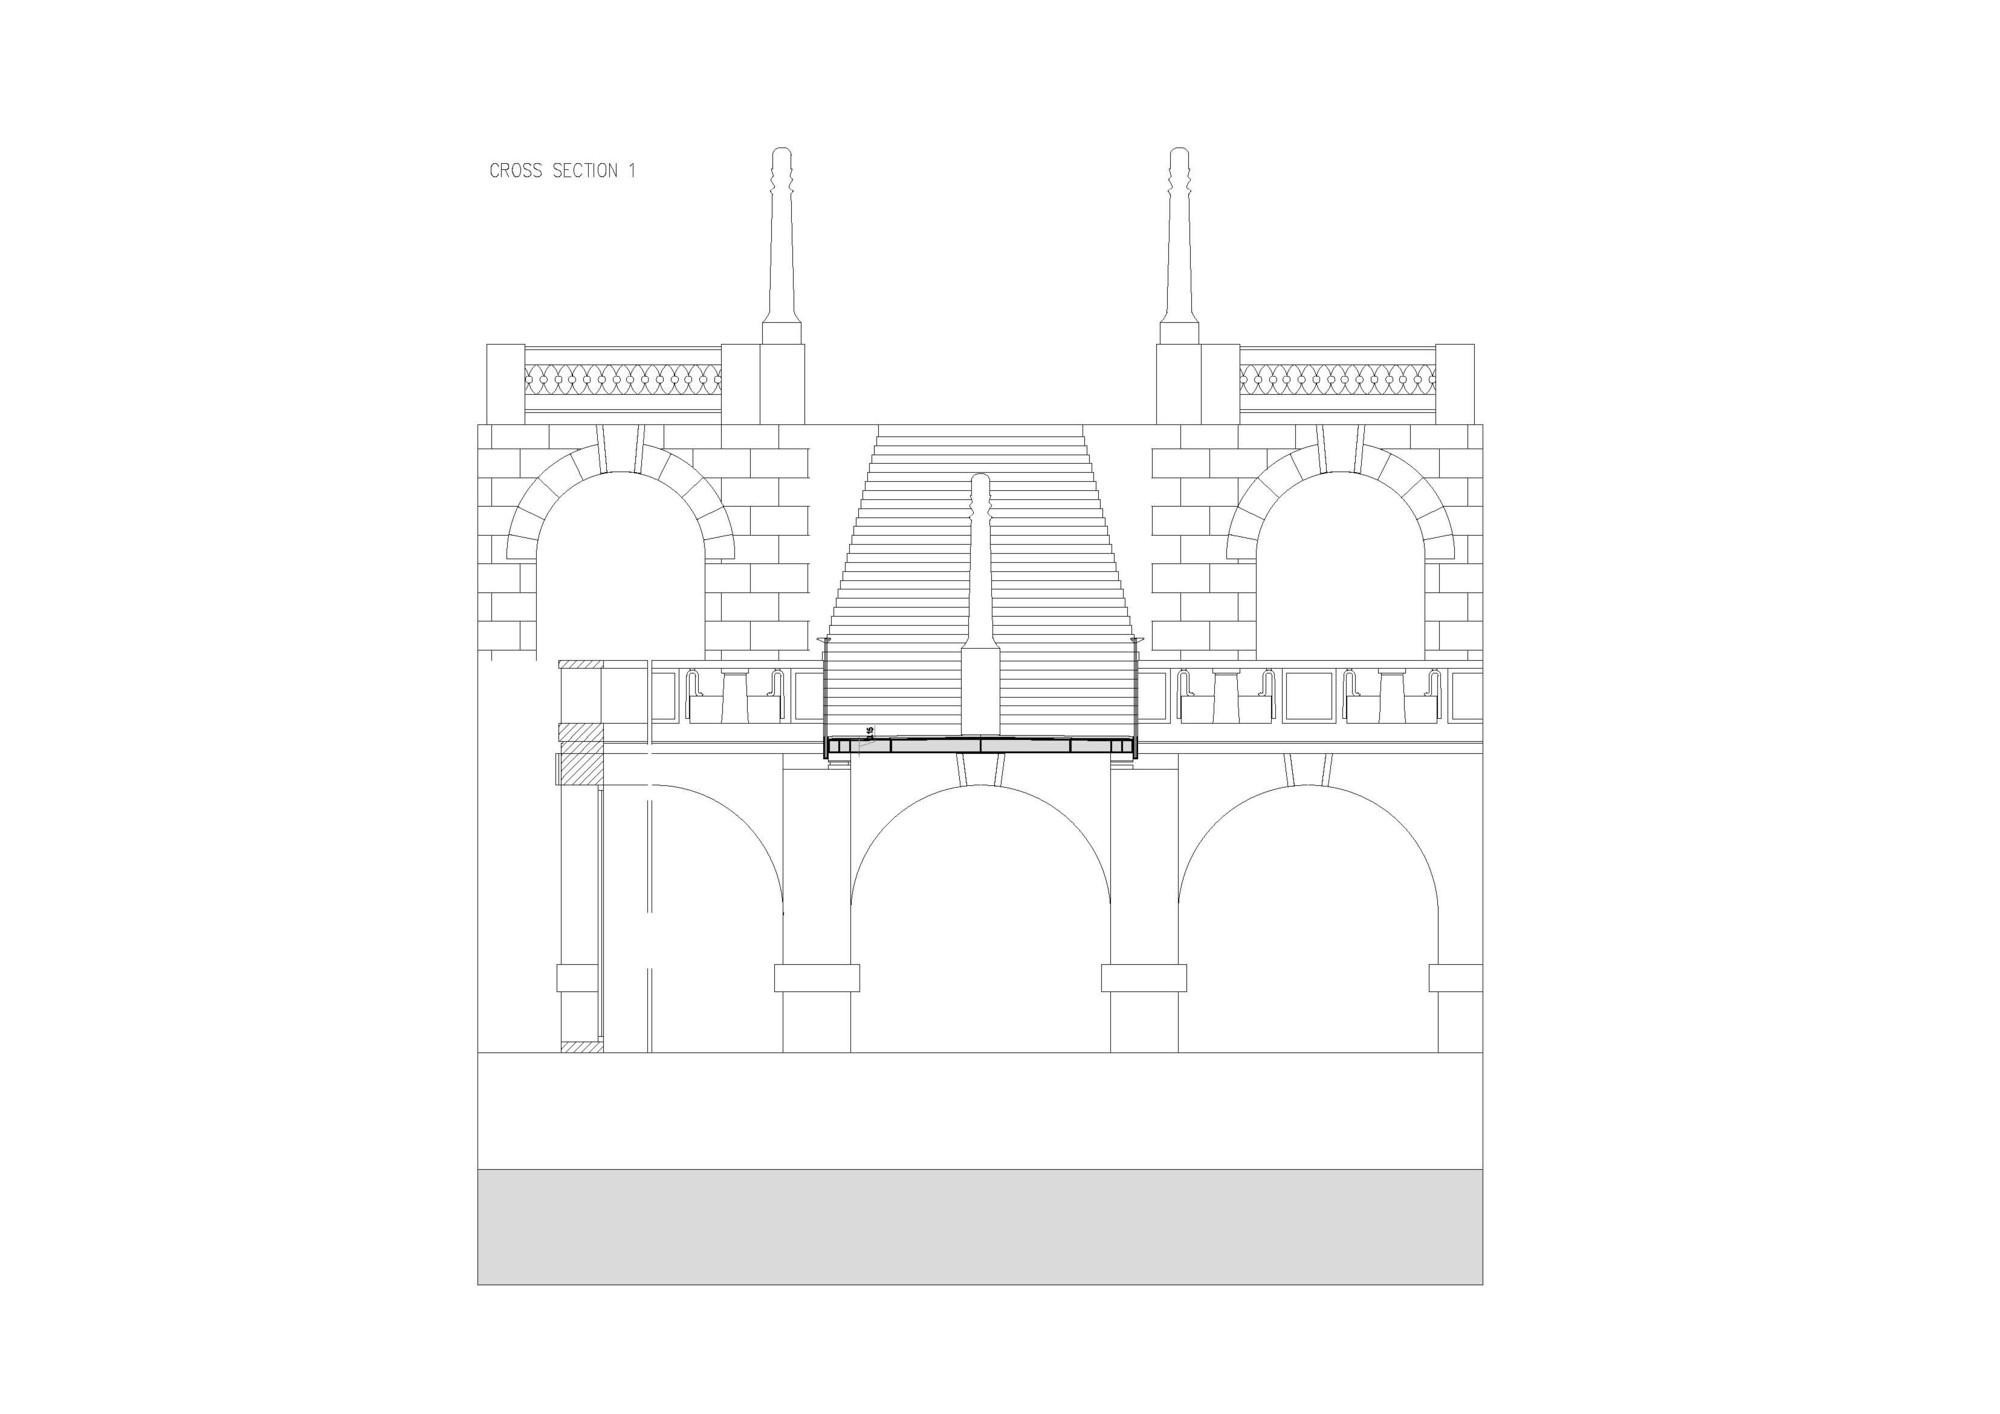 Courtesy of Arhitektura d.o.o.